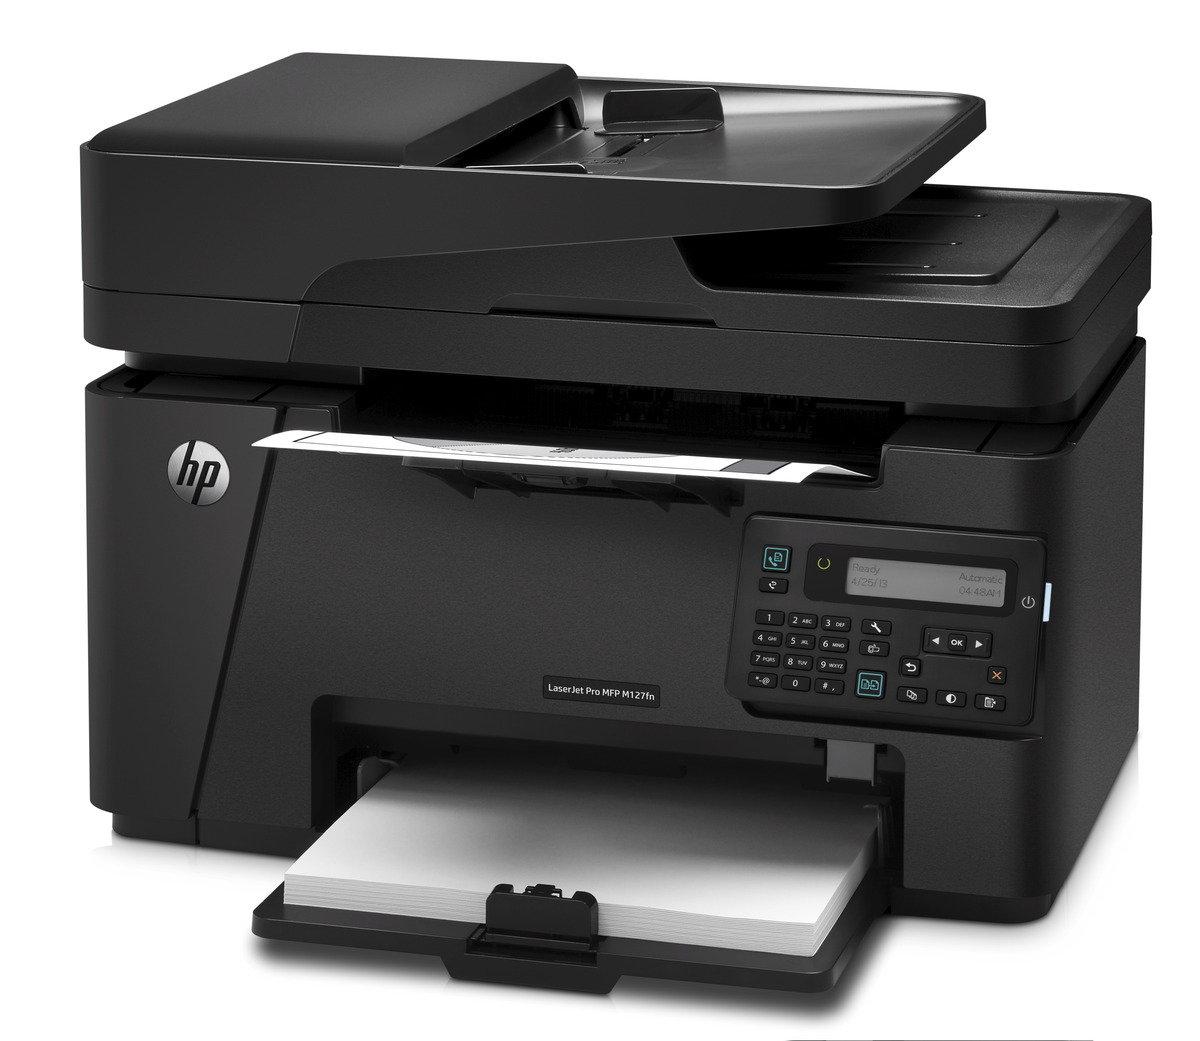 HP Laserjet Pro MFP M127fn 黑白鐳射雲端多合一打印機